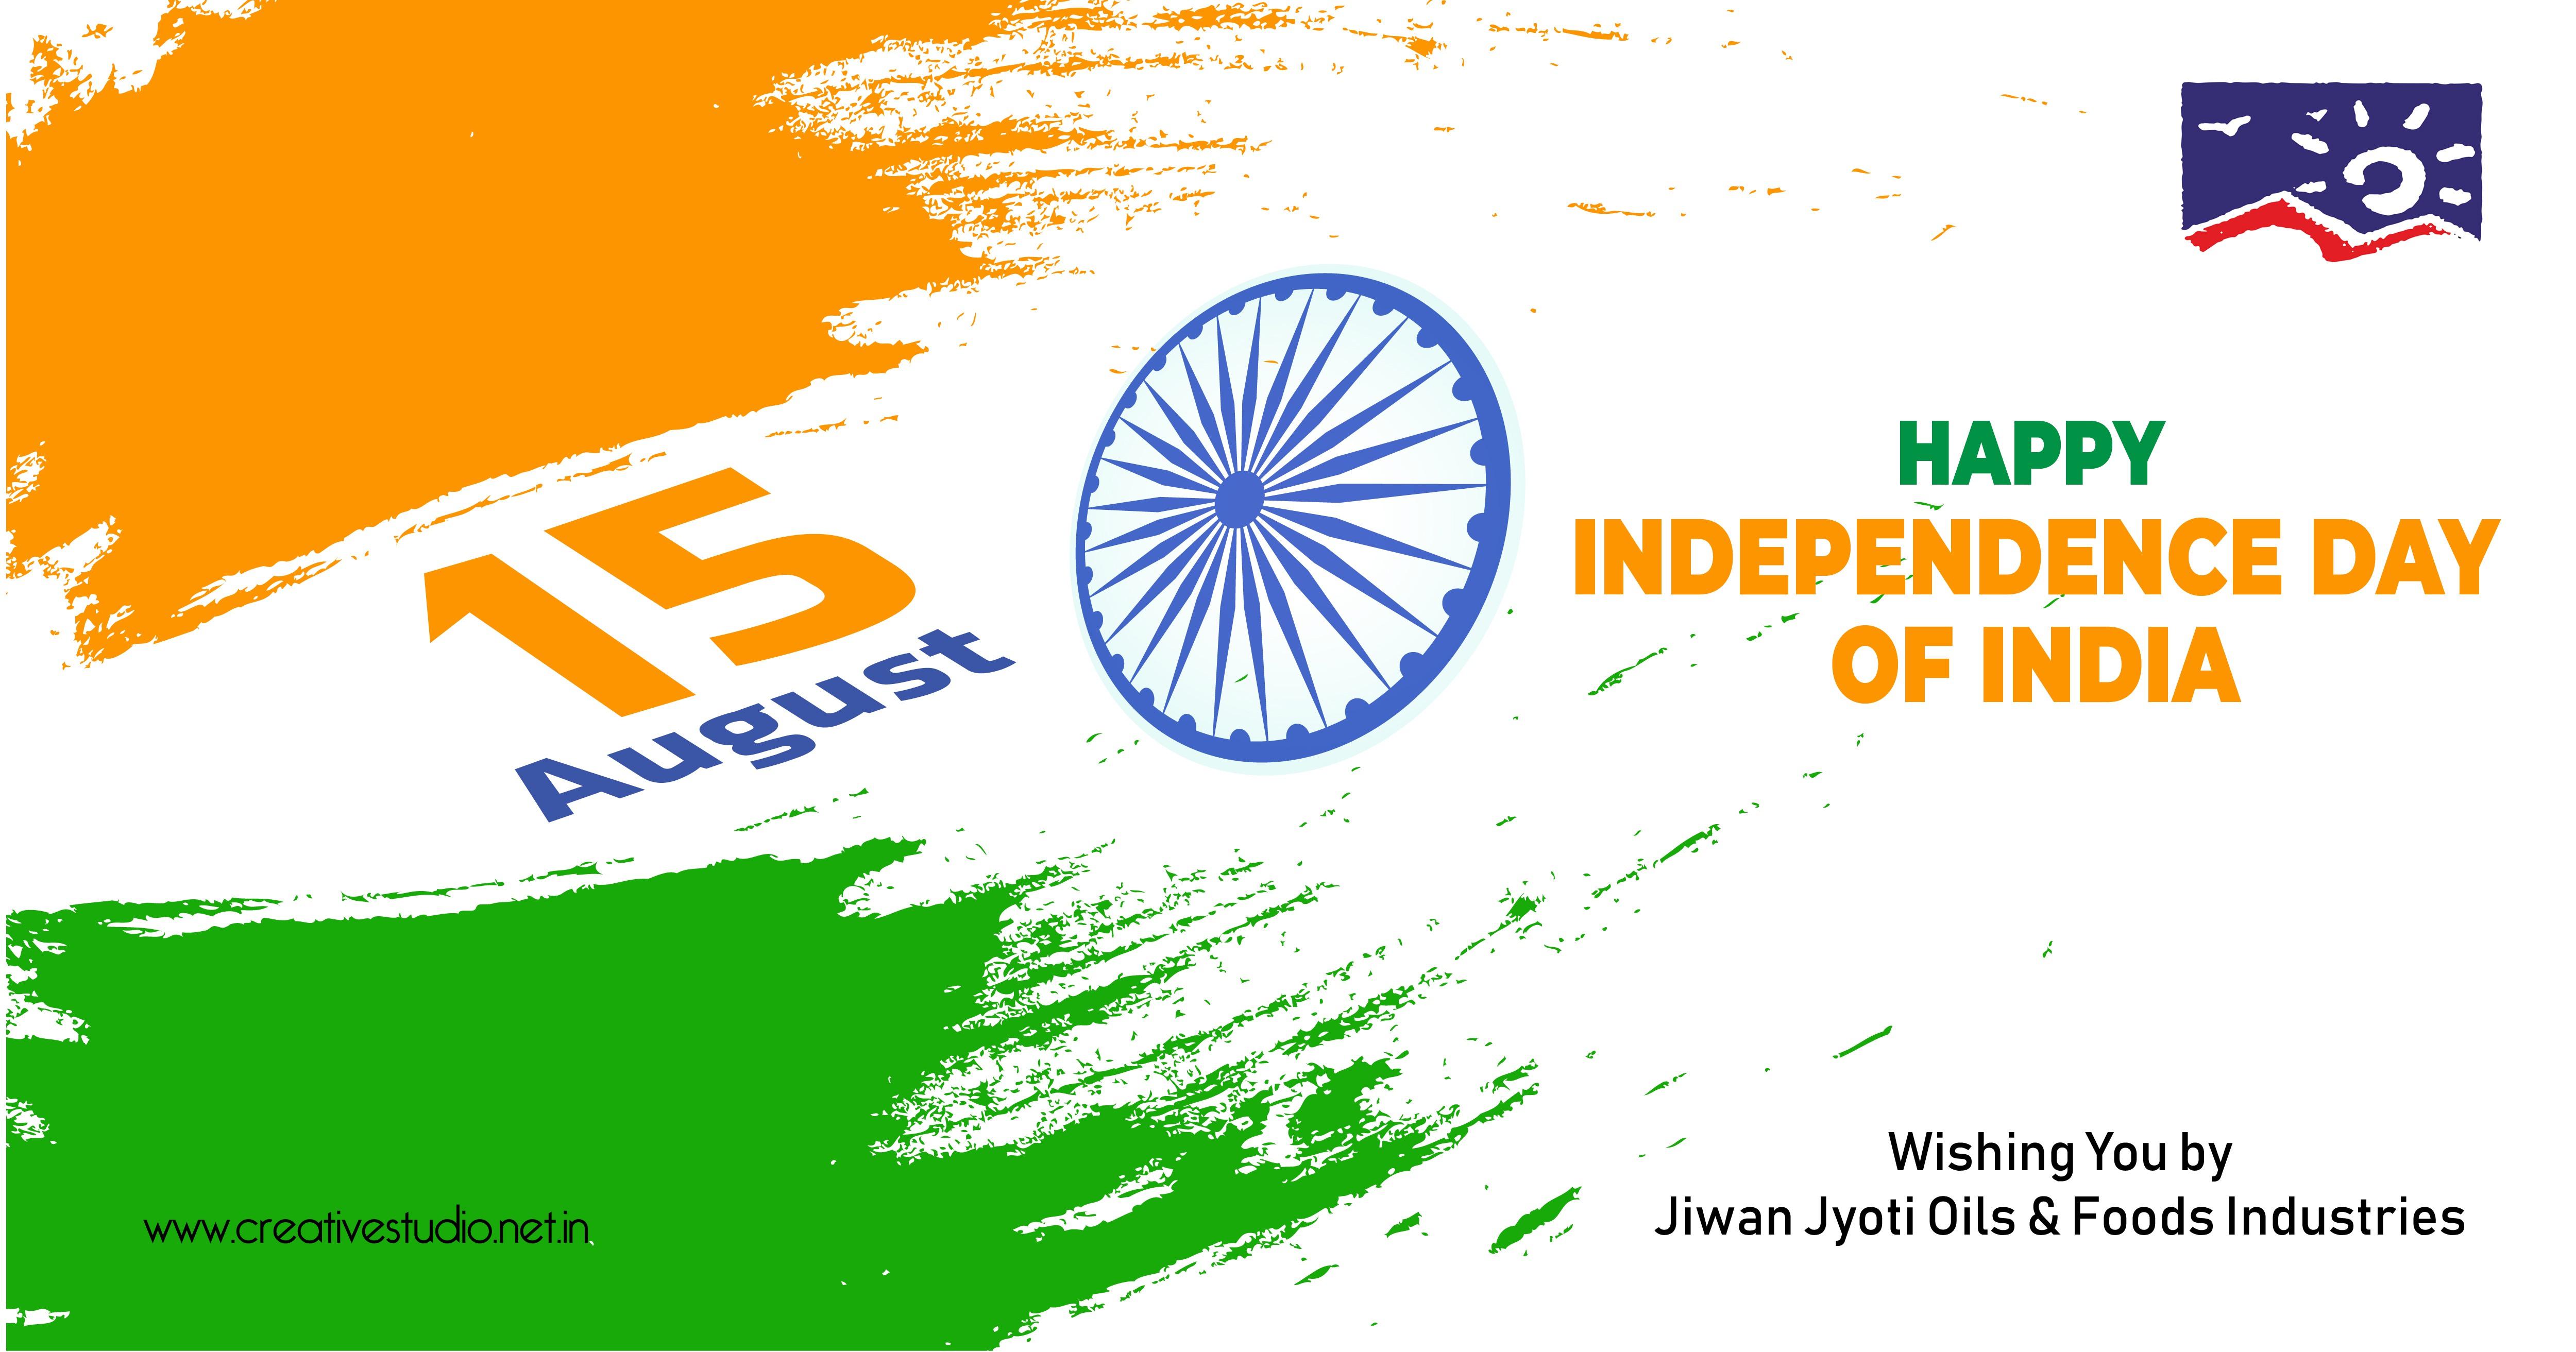 3 Jiwan Jyoti Oils Foods Industries Independec day celebration 03 - Social Media Creatives